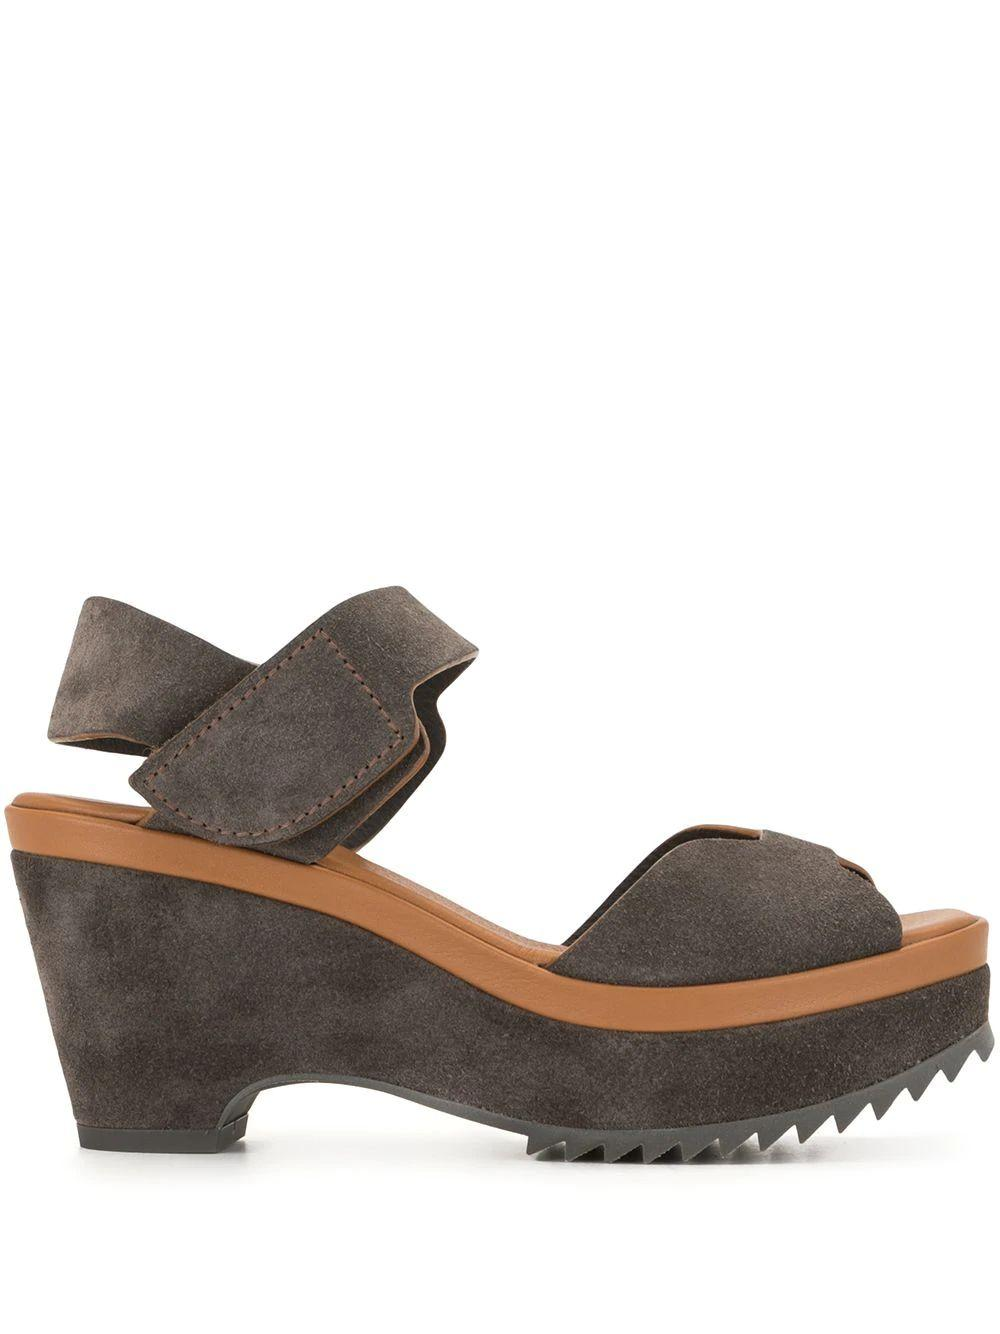 Fah Suede Platform Sandal Item # FAH-INK